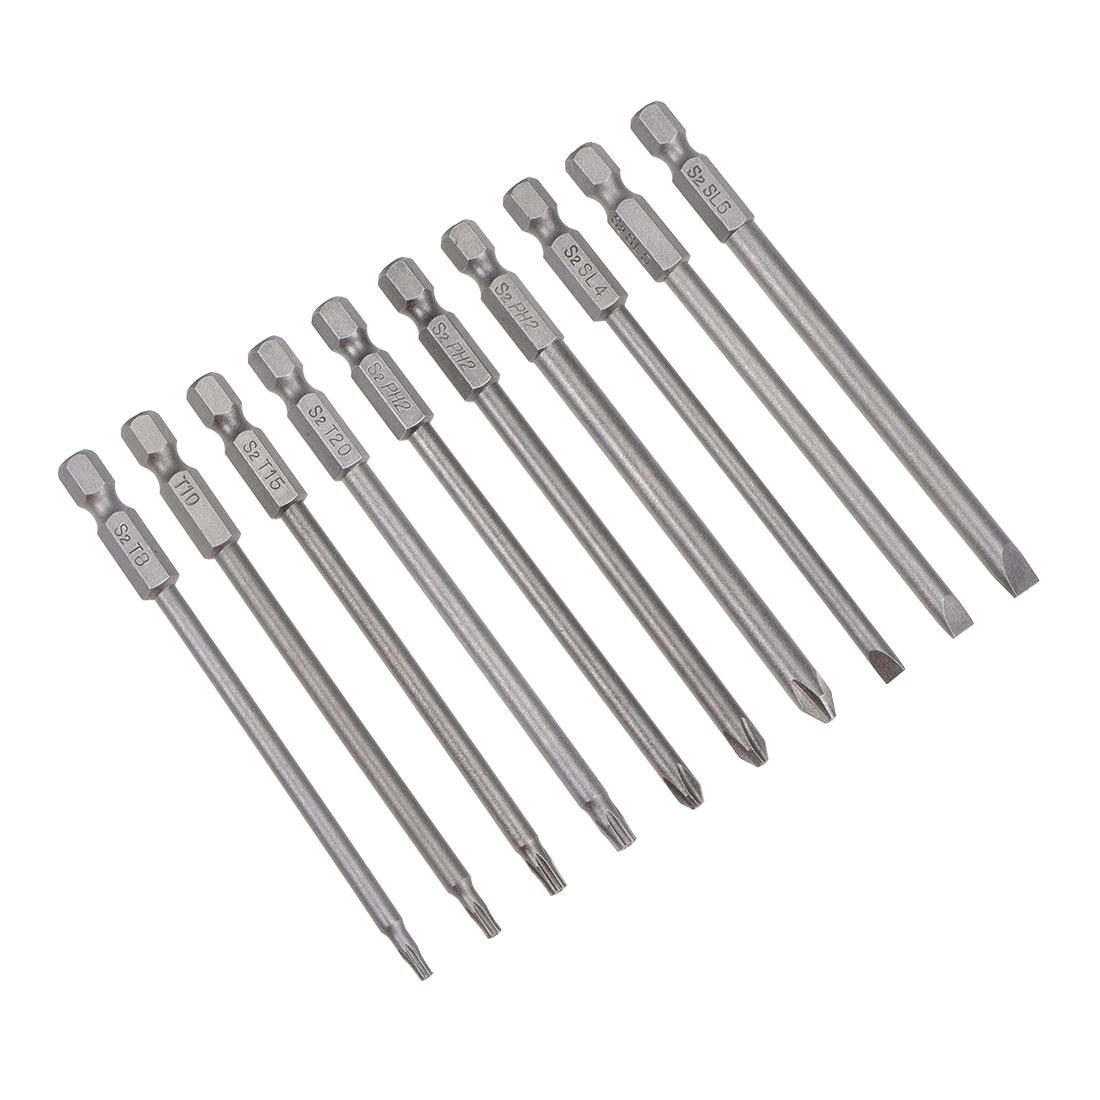 Screwdriver Bits Set 10pcs 1/4 Inch Hex Shank Magnetic Phillips Torx Slotted